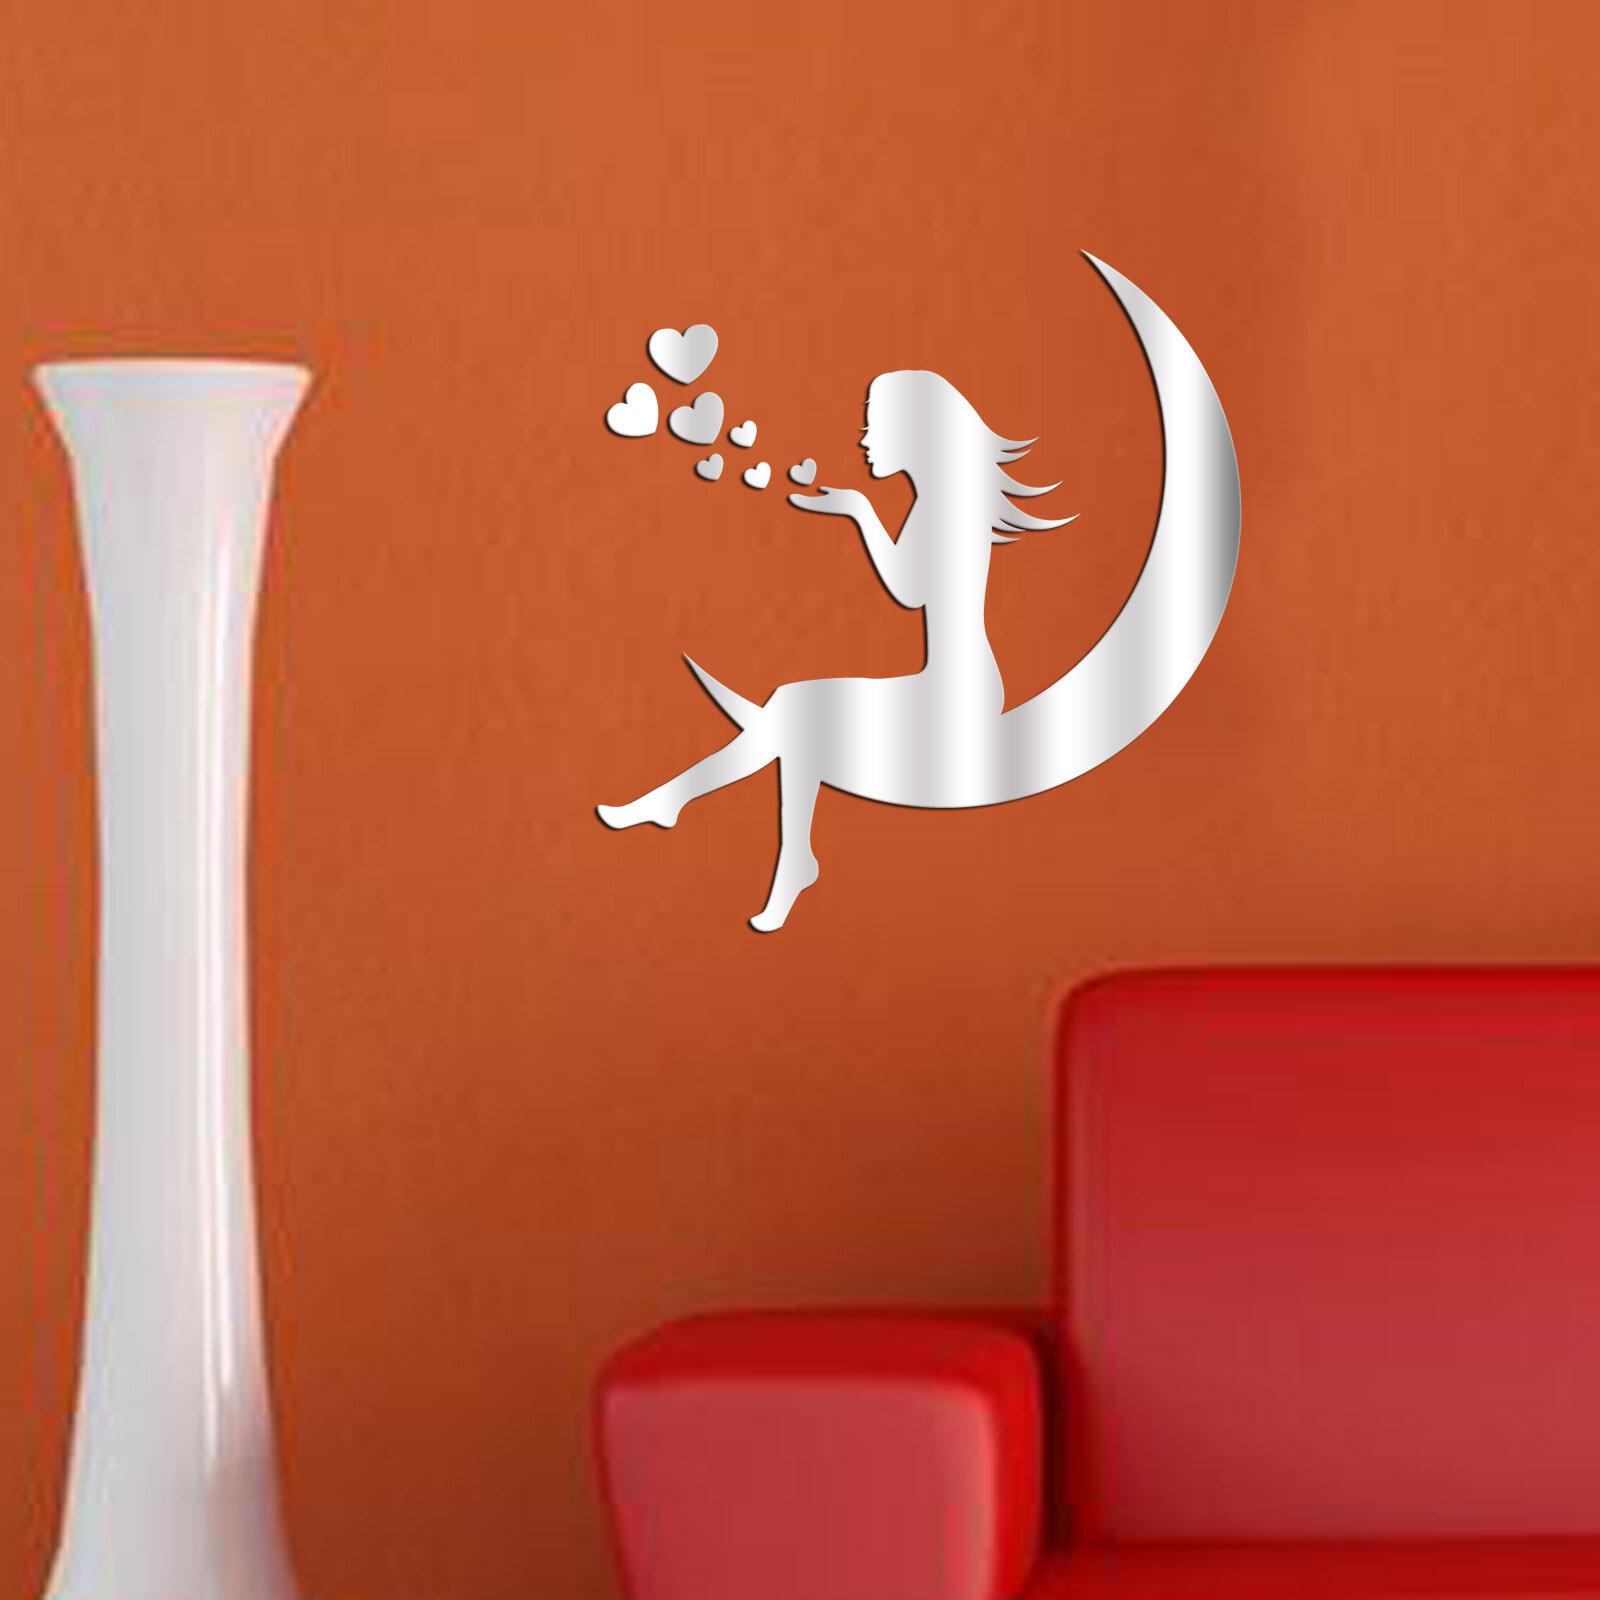 Oglinda decorativa Desire, 234DSR2821